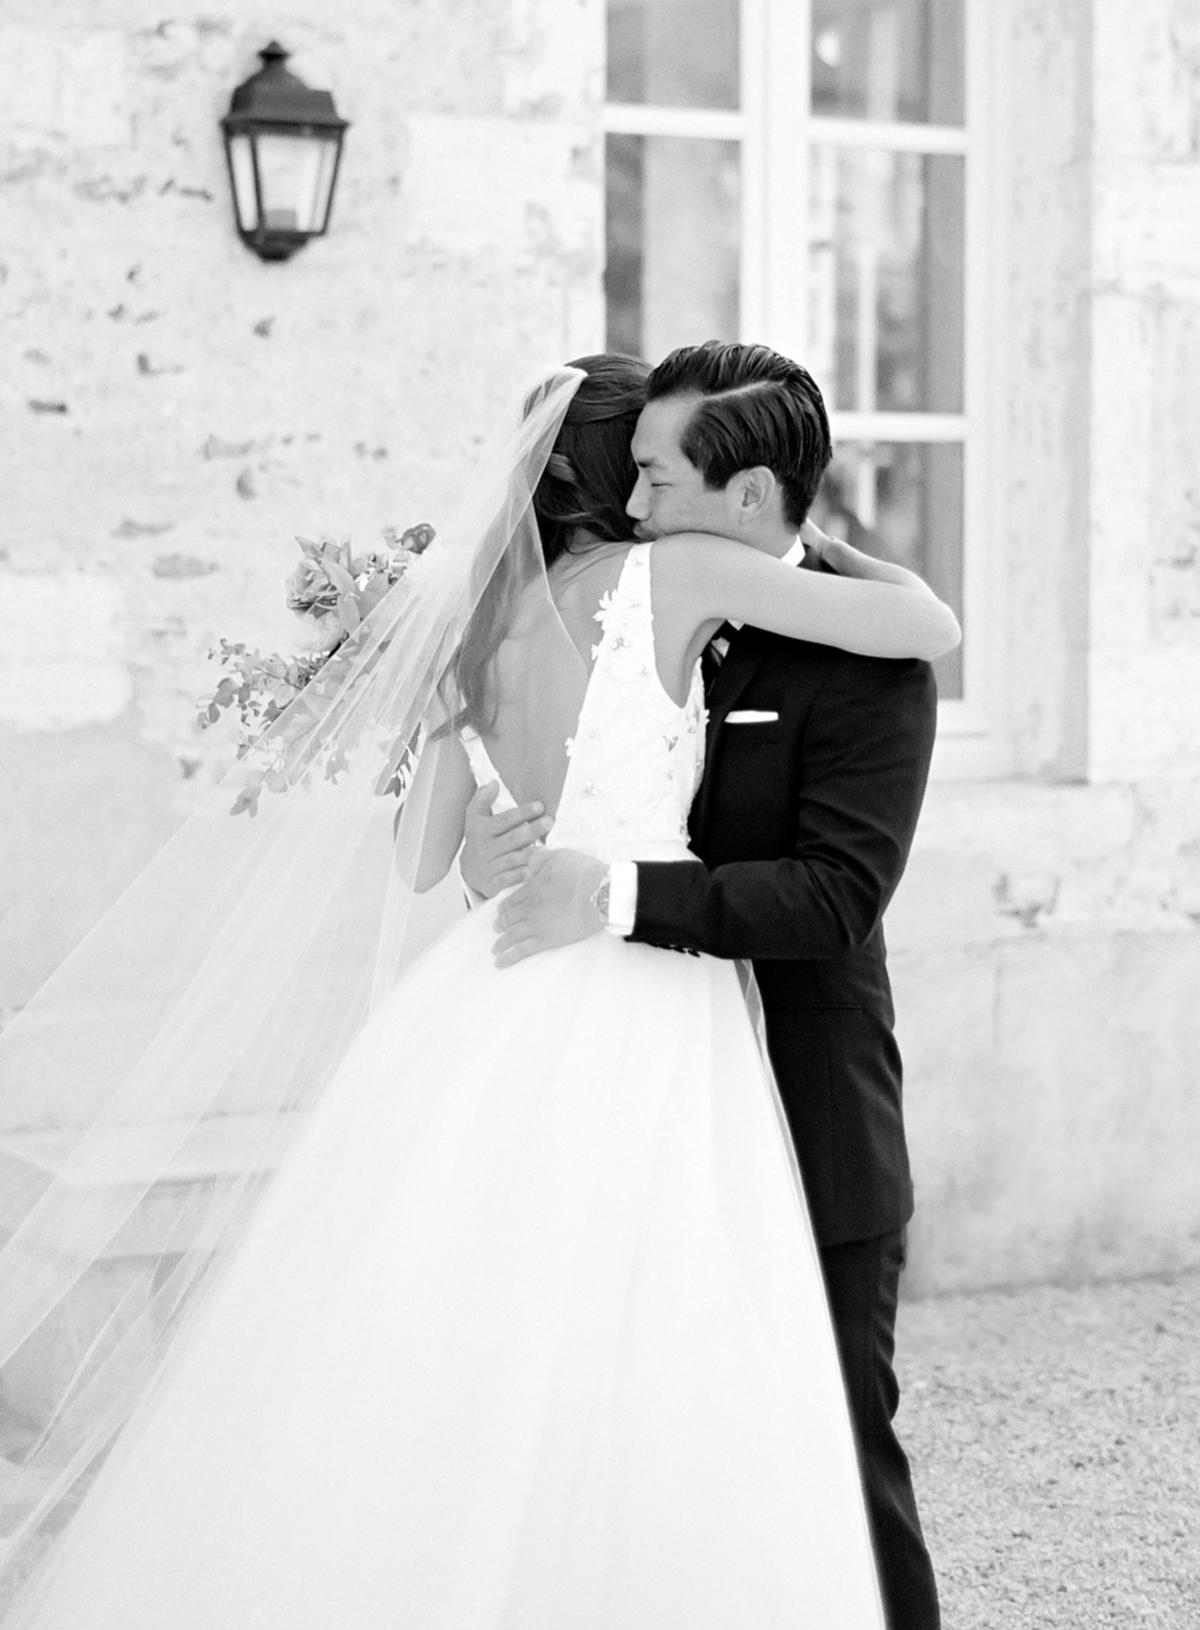 Chateau de varennes sinclair and moore wedding 0040b